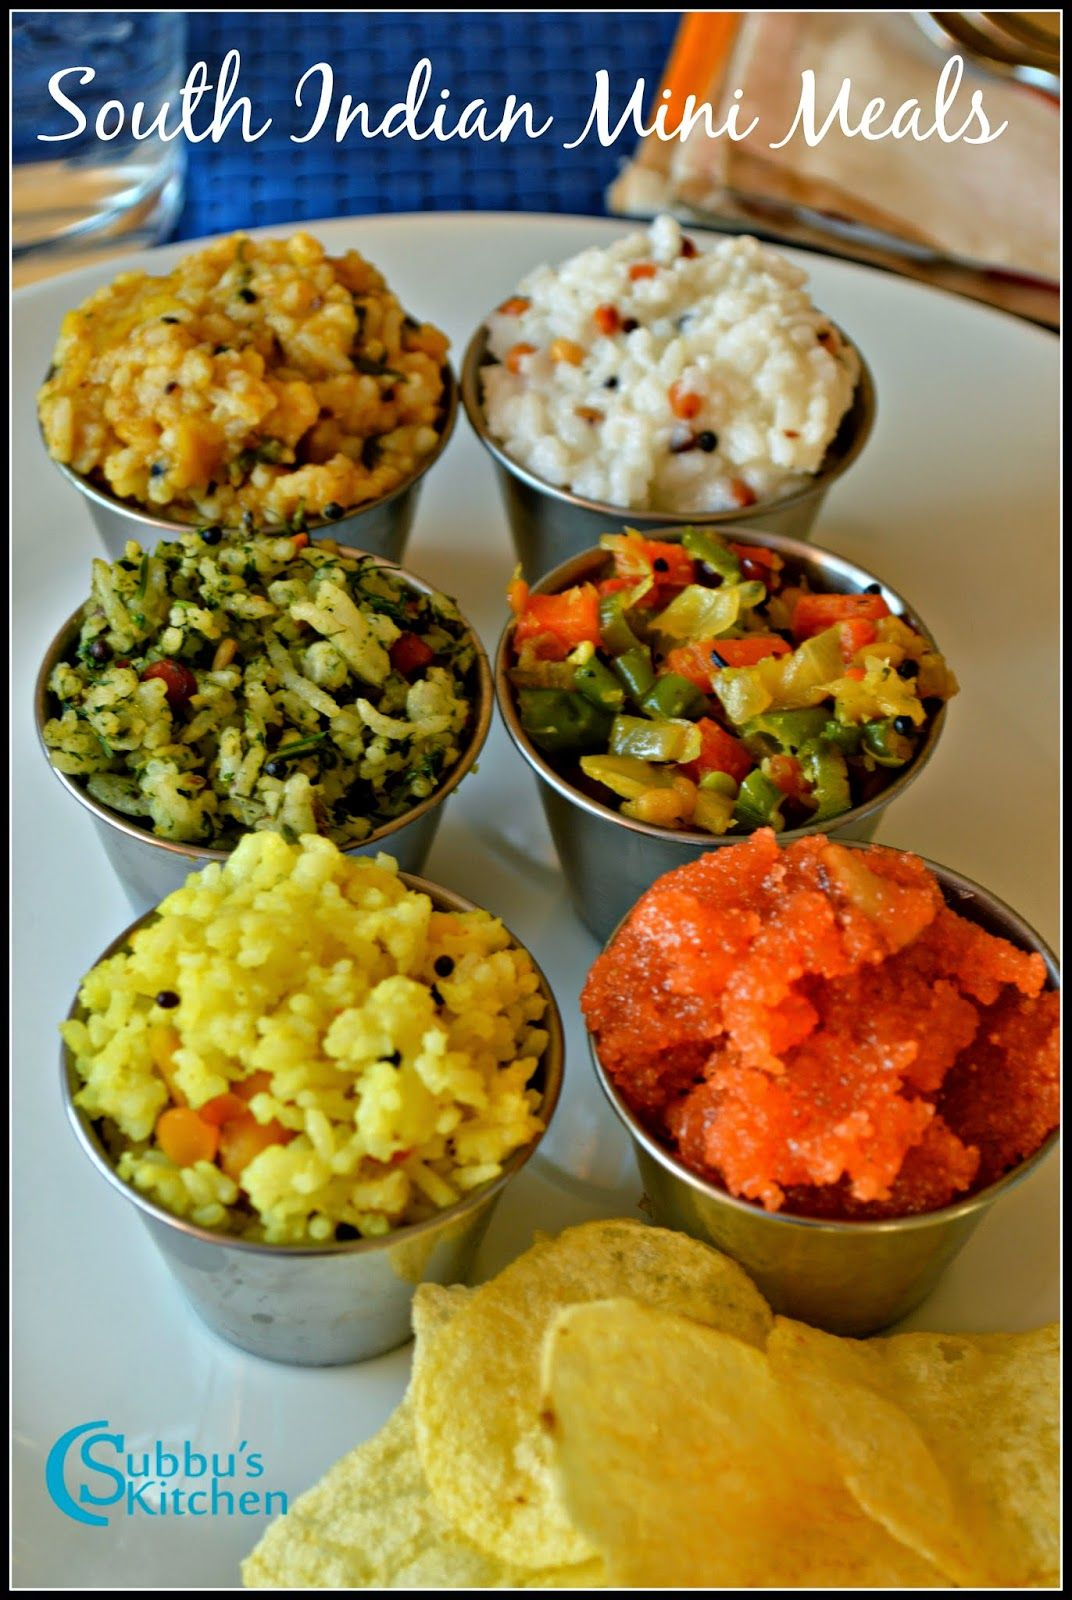 South Indian Lunch Menu 14 Southindian Mini Meals Kesari